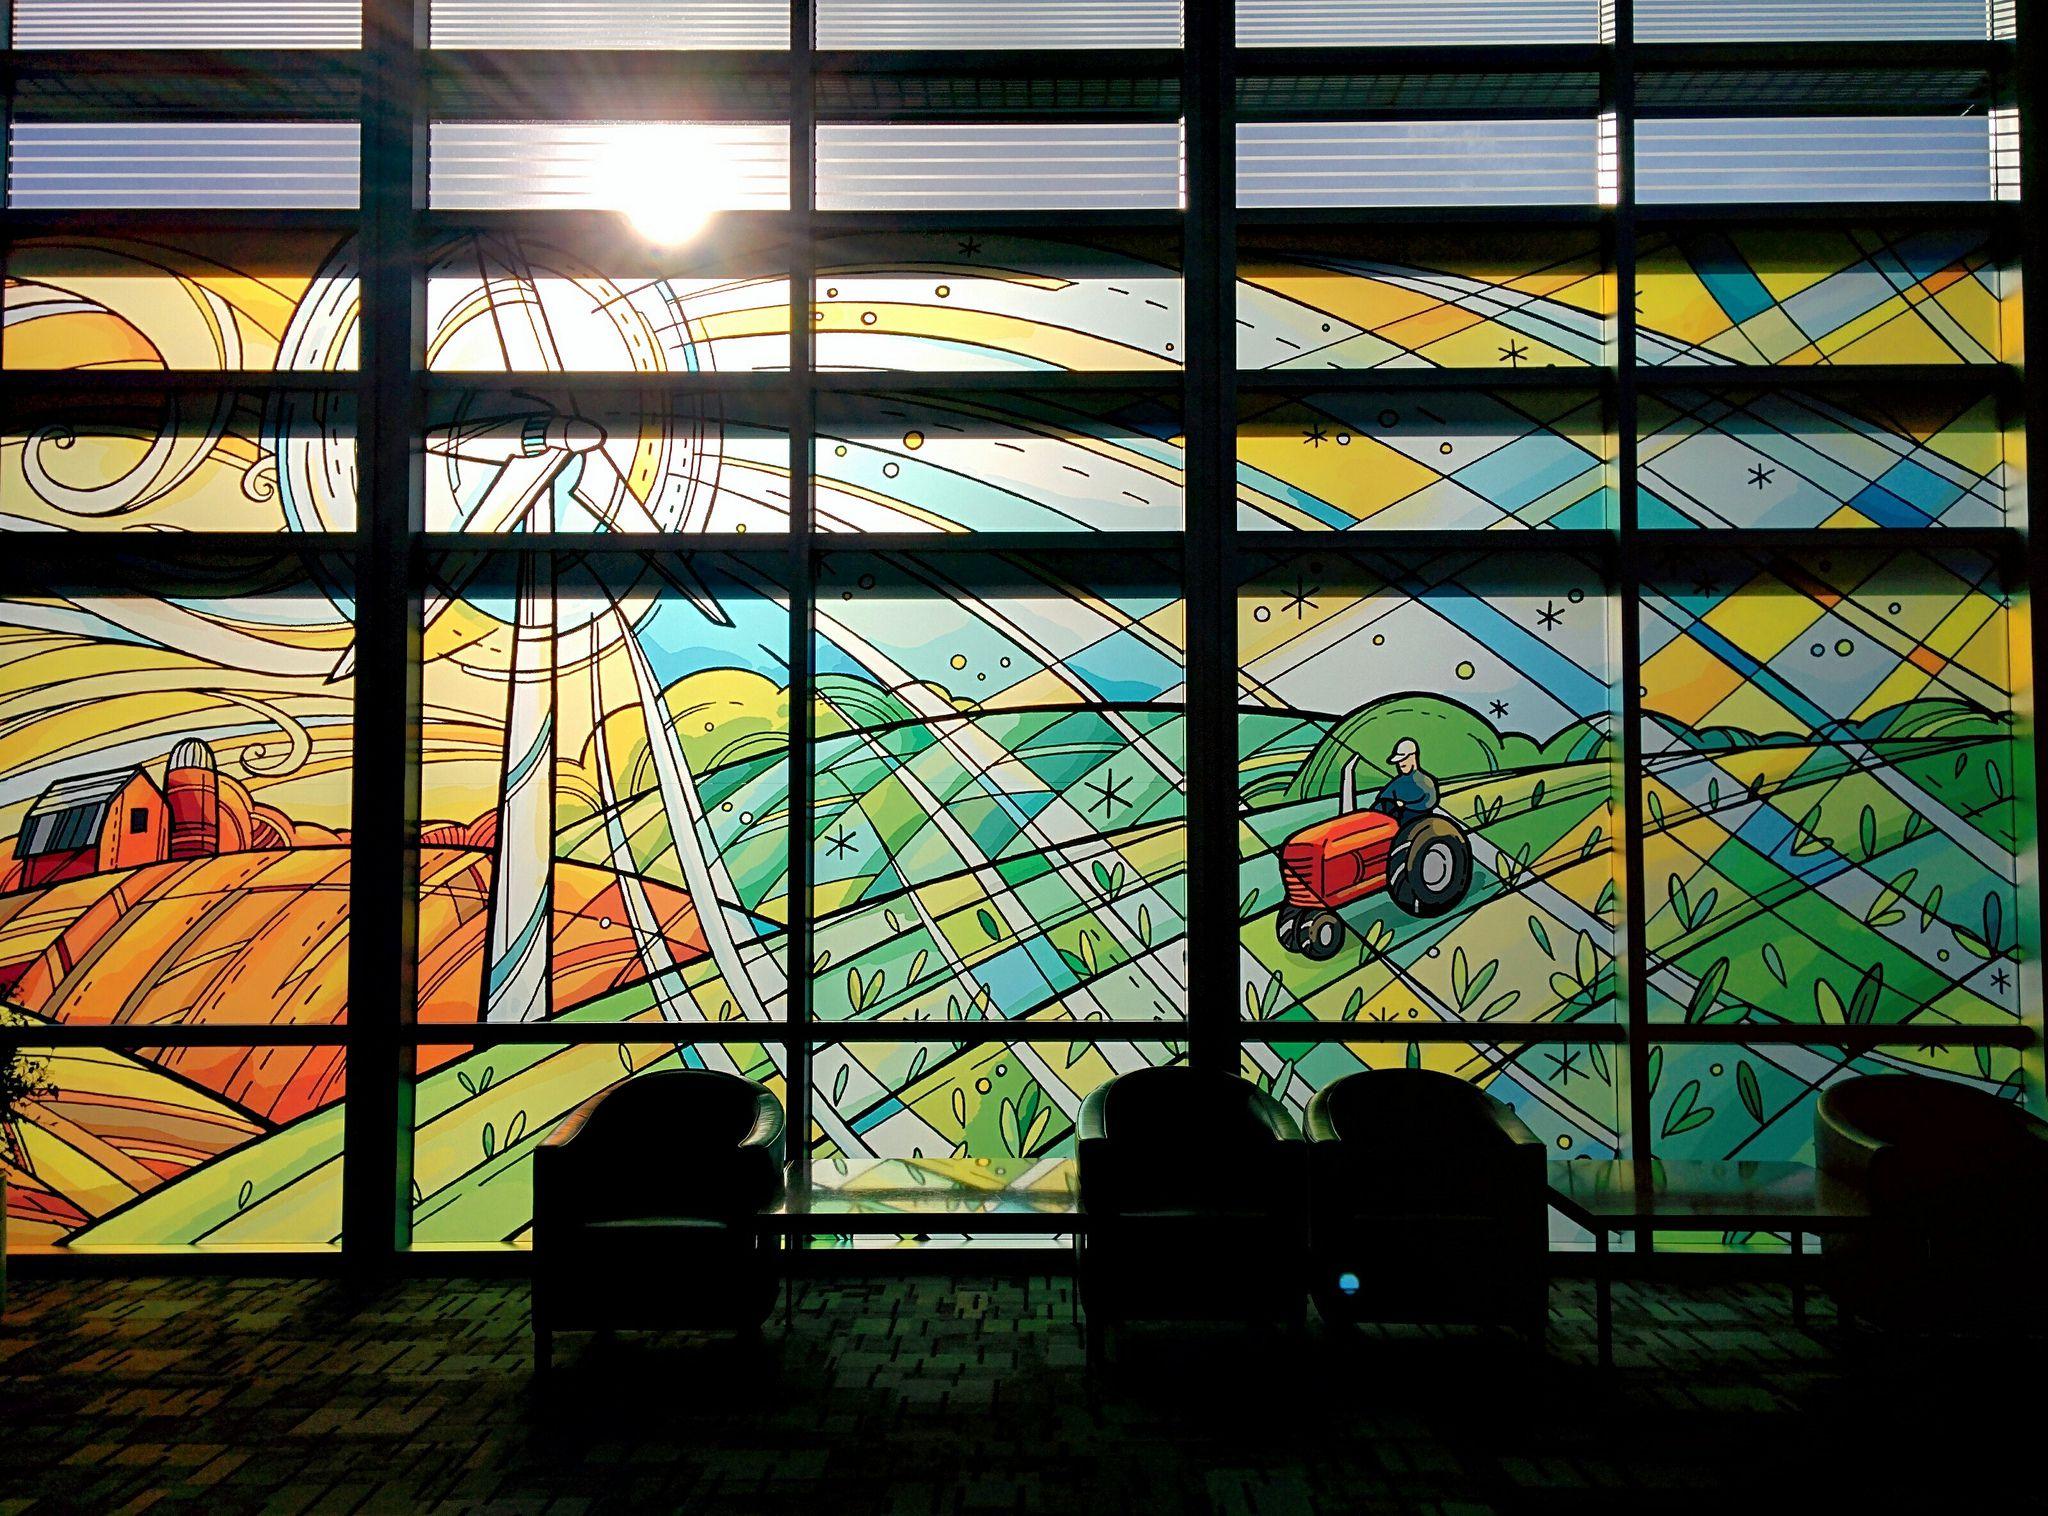 Glass Art at Minneapolis−Saint Paul International Airport